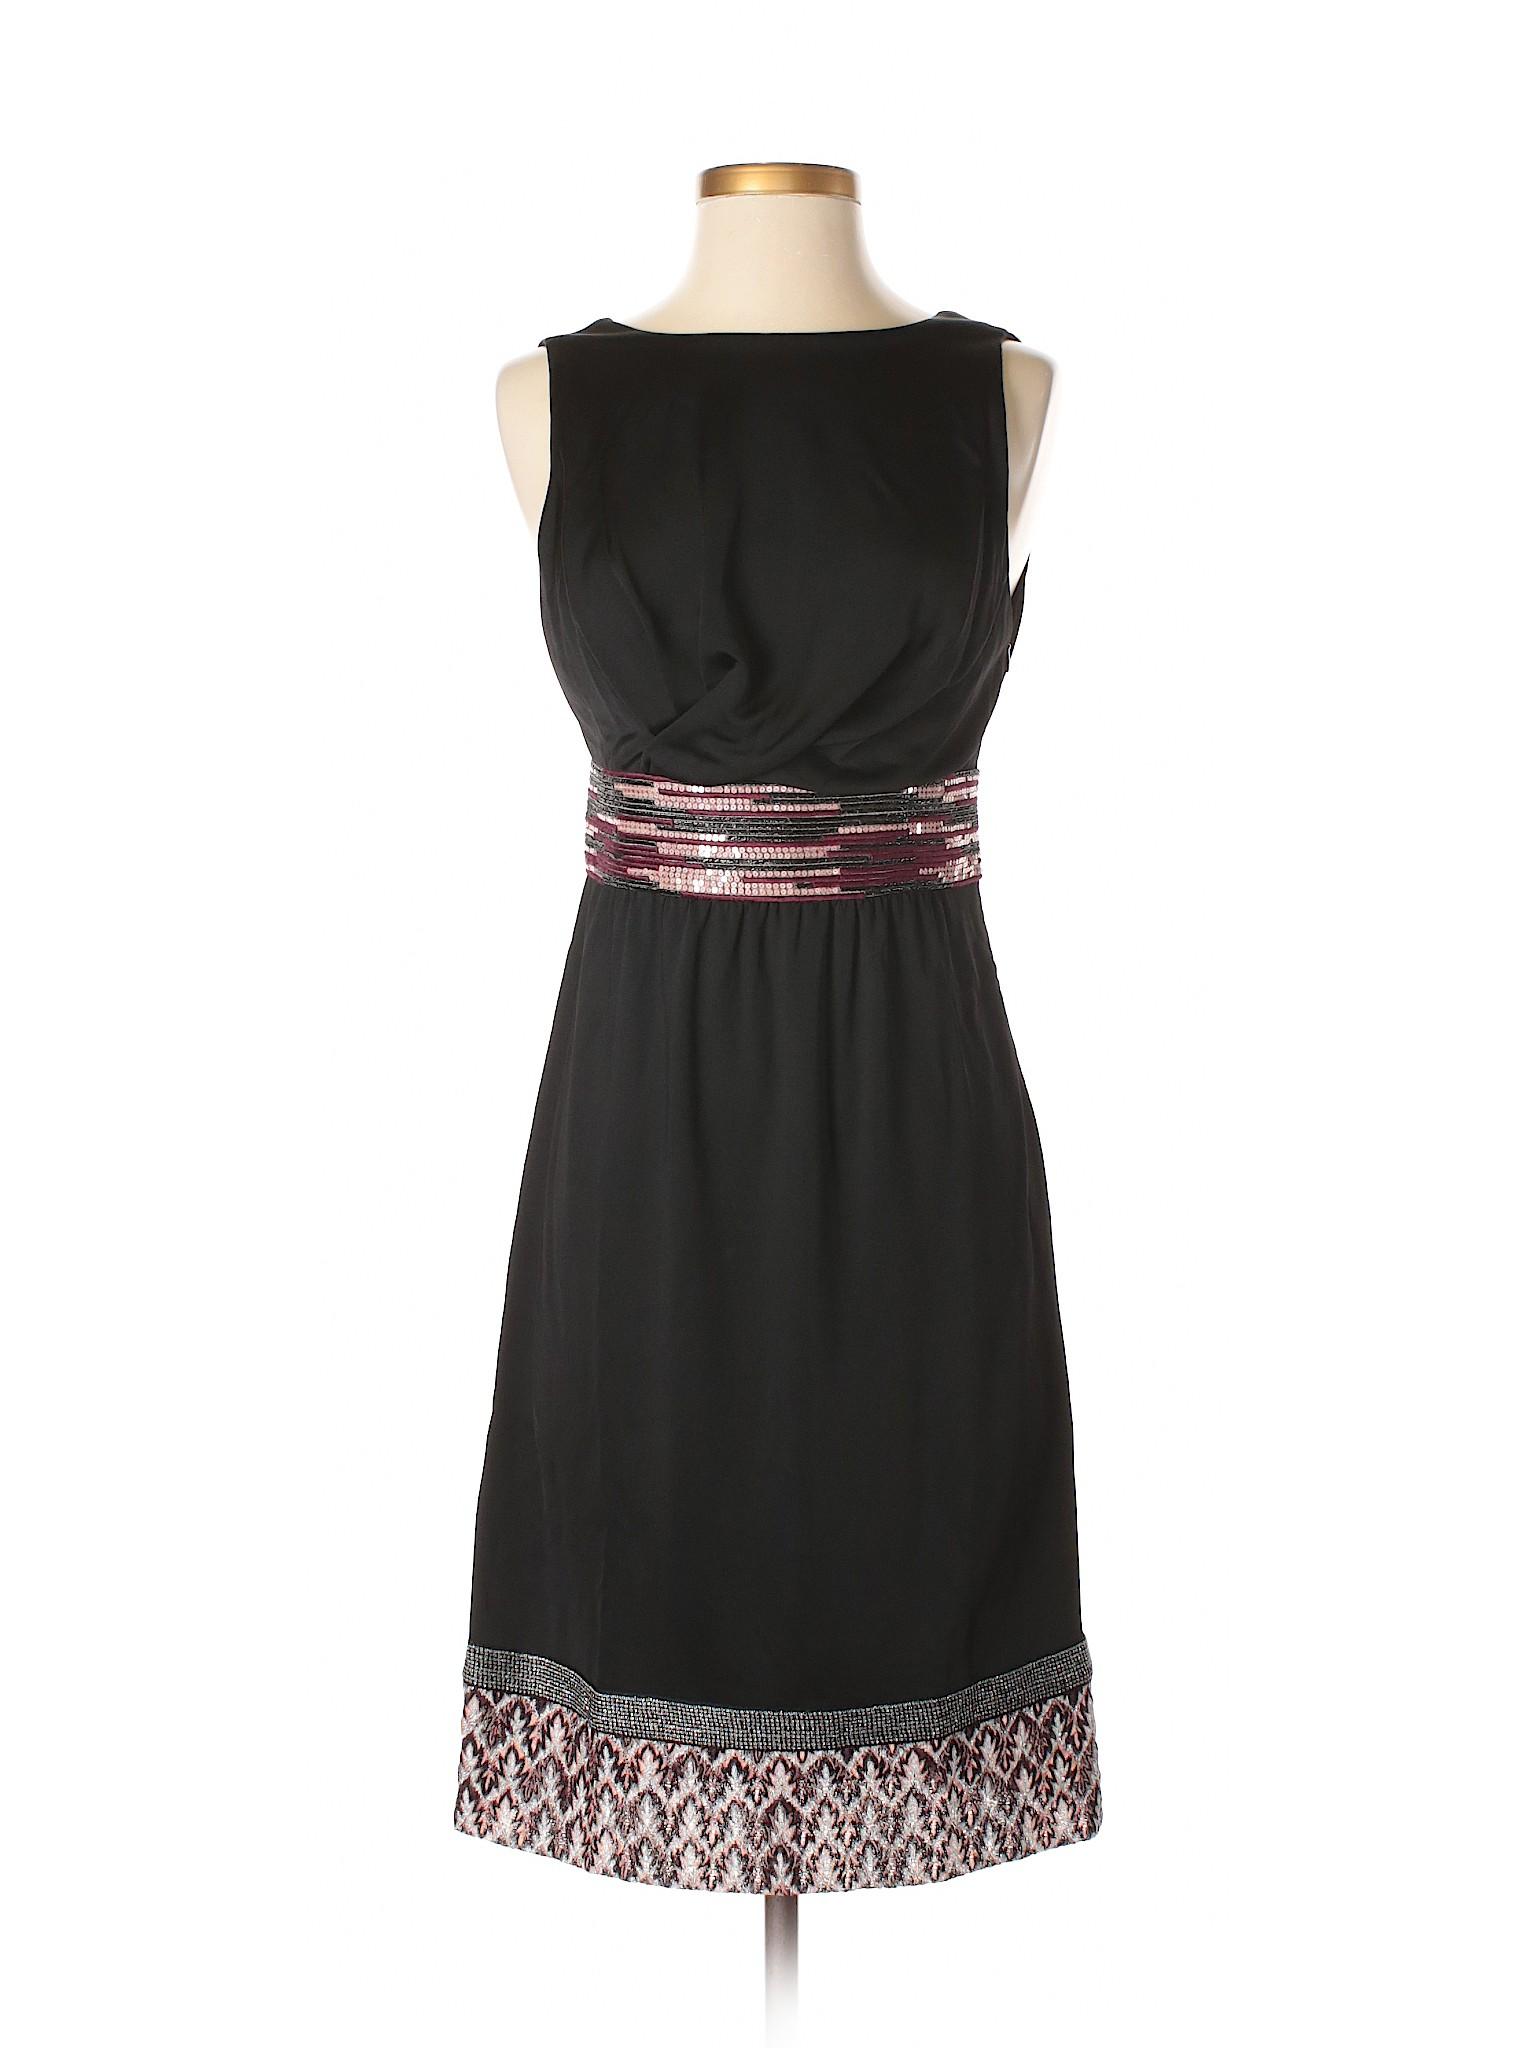 Boutique Dress winter winter Boutique Casual Missoni p7aqwC